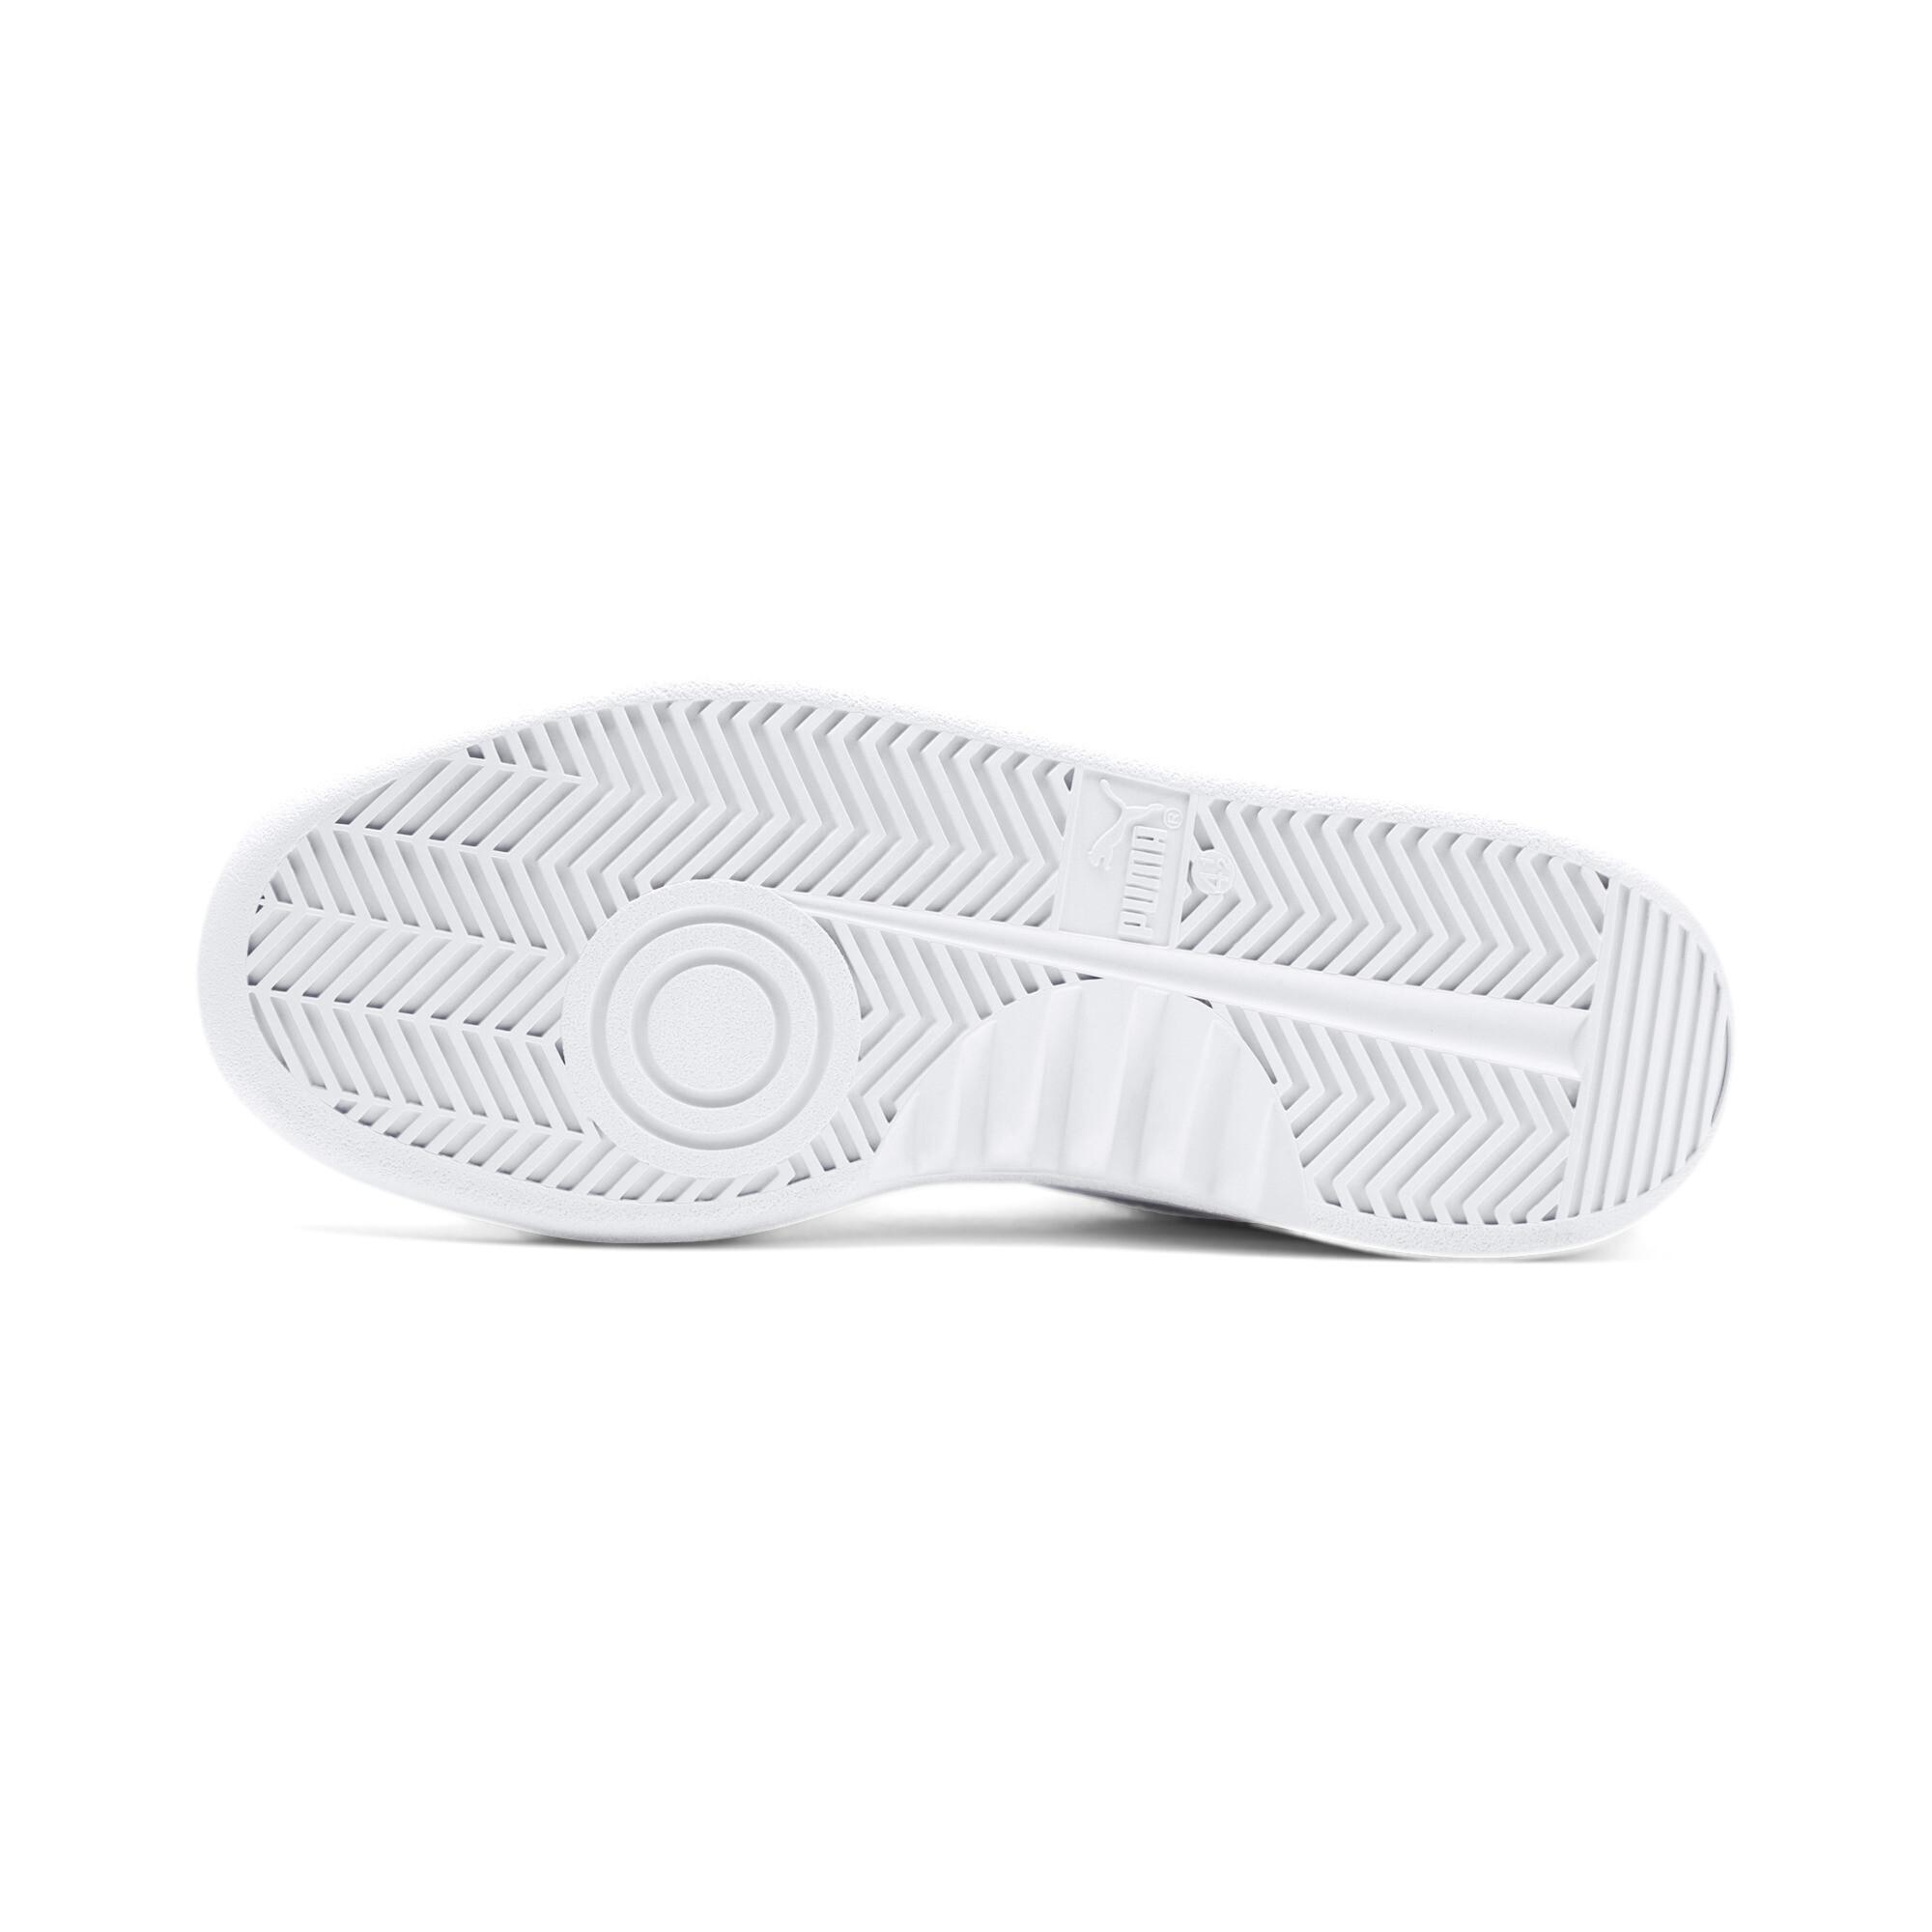 PUMA-Women-039-s-California-Monochrome-Sneakers thumbnail 11